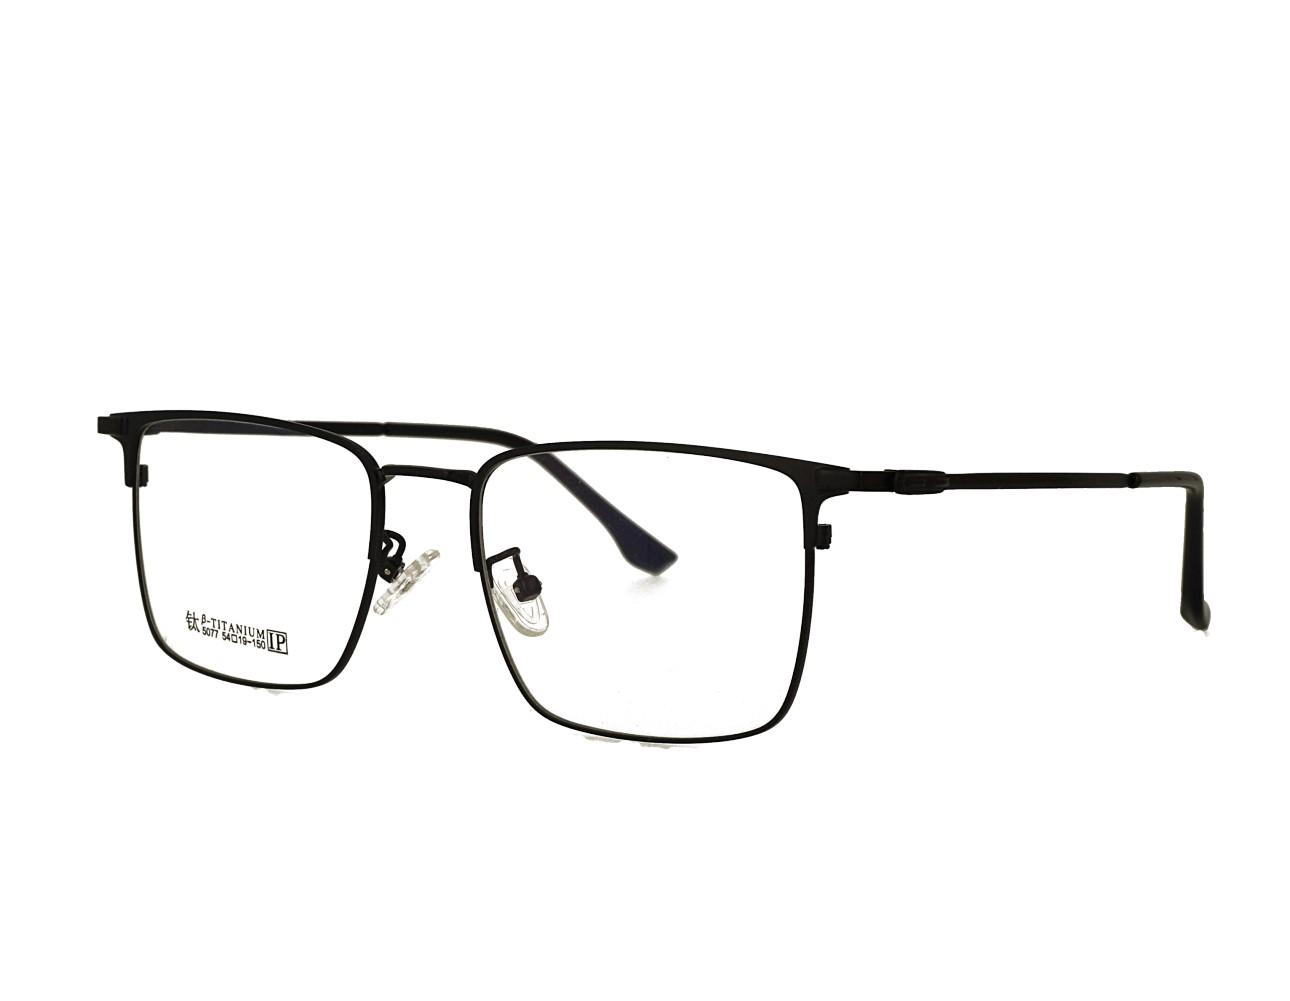 54size Rectangle Designer Optical frame Stainless Steal Eyeglasses Mans Eyewear